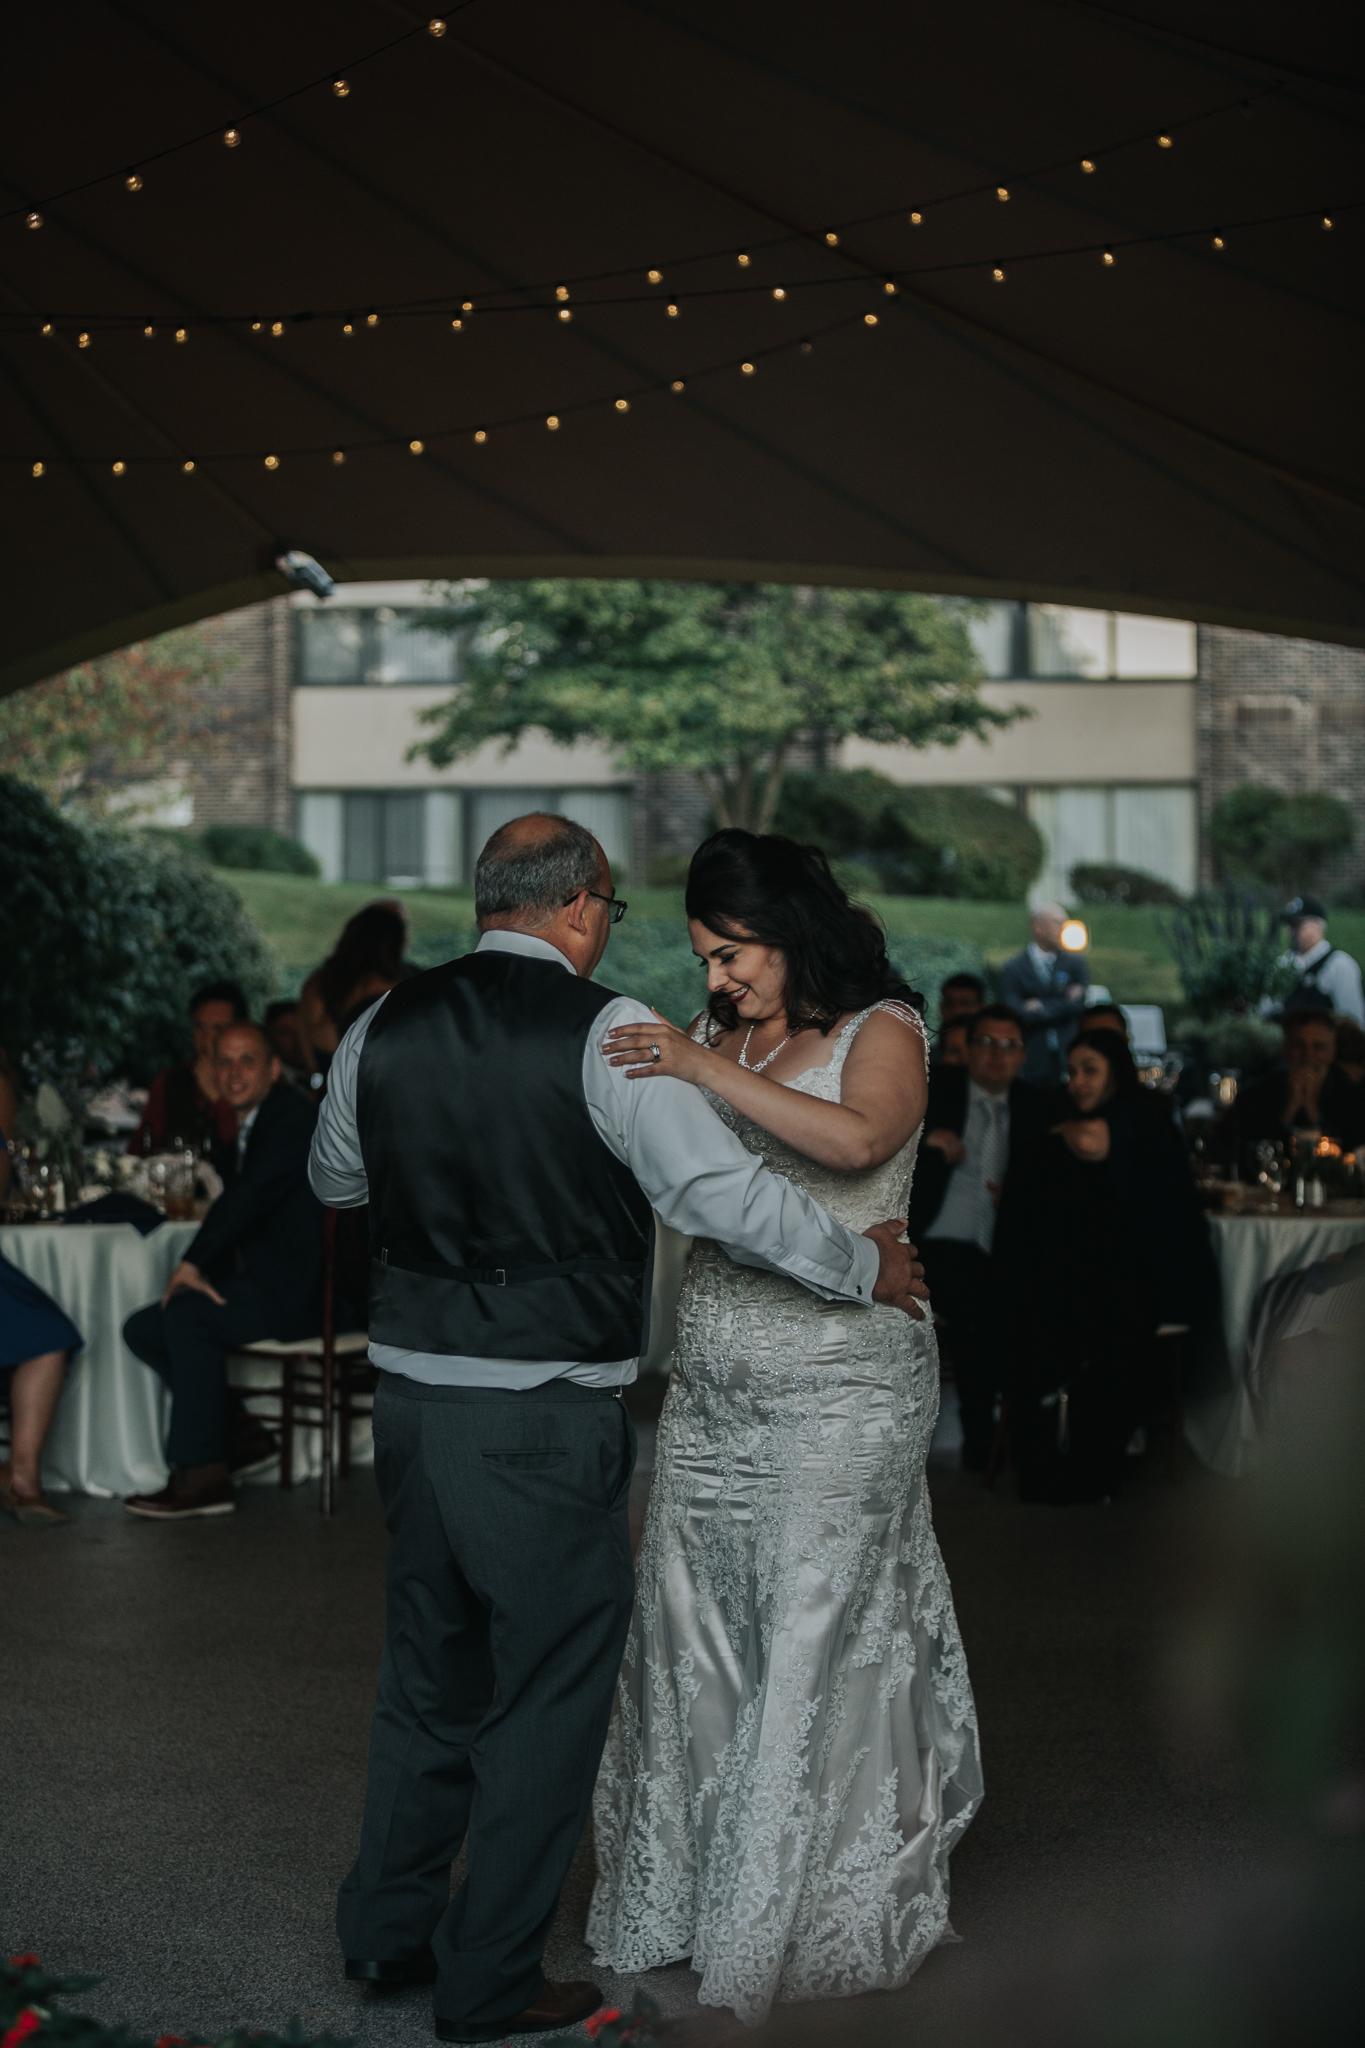 grand-rapids-photographer-traverse-city-wedding-organic-moody-eclectic-kiwi